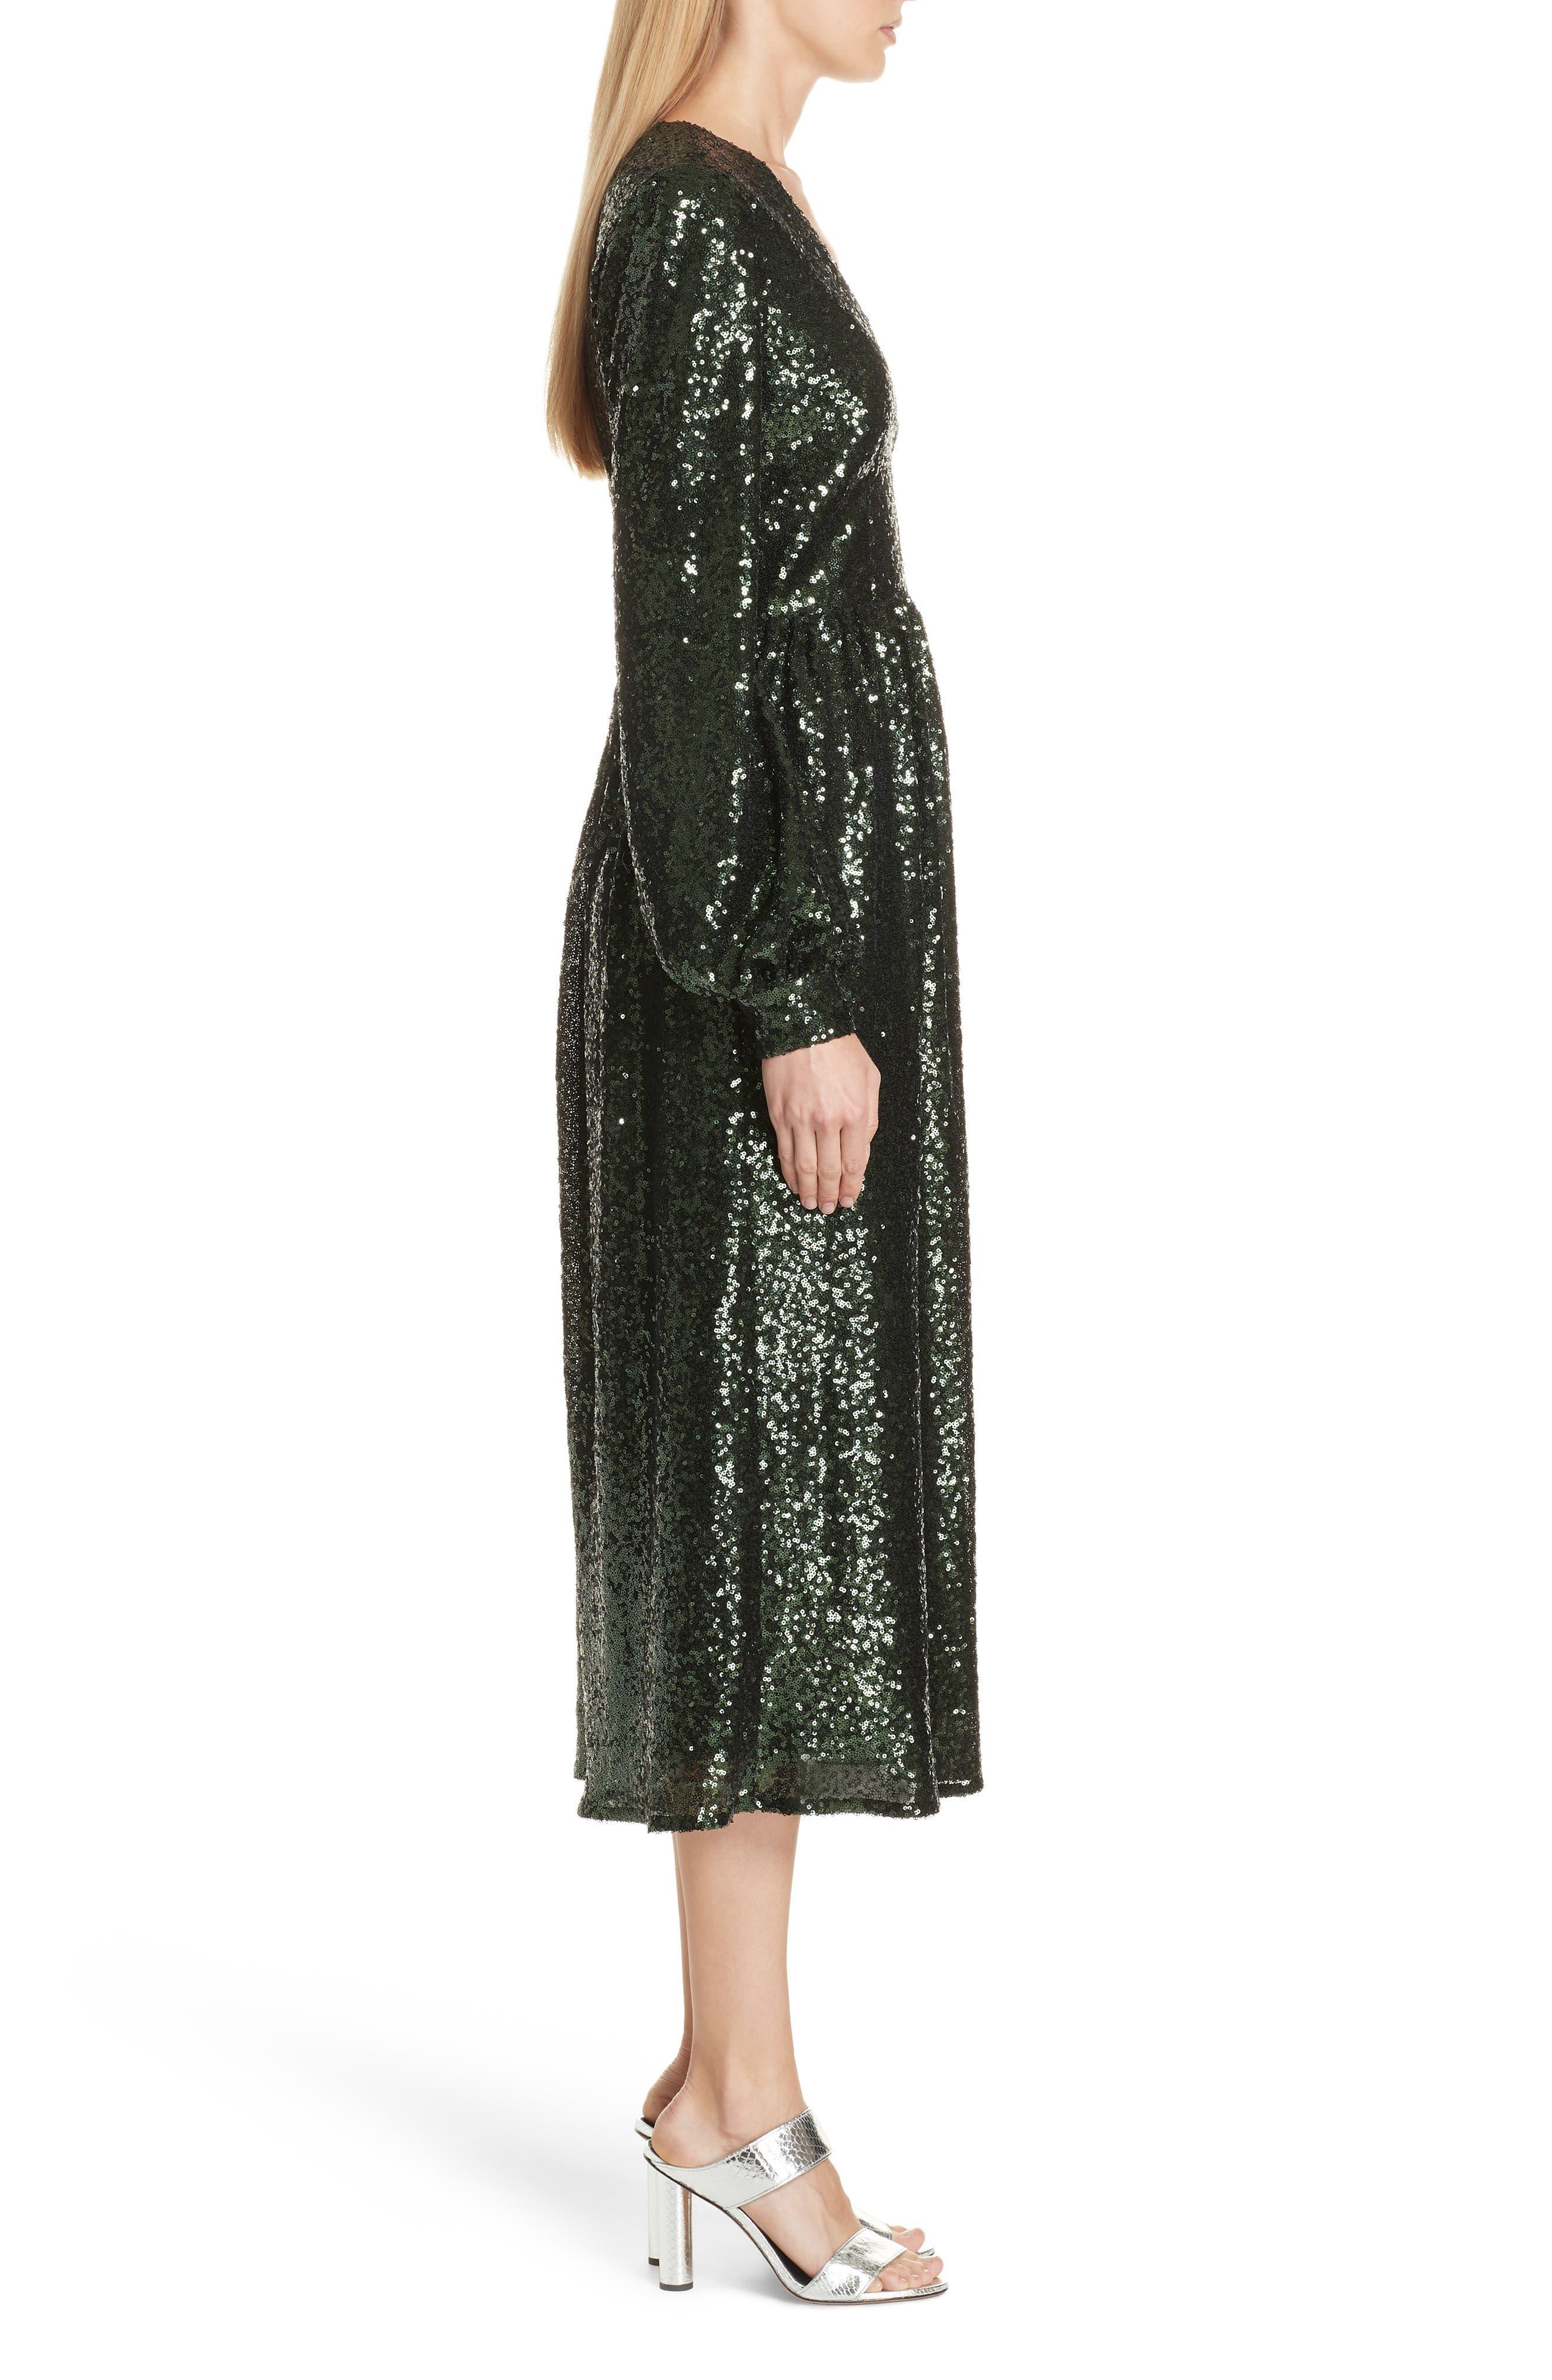 SALONI, Camille Sequin Midi Dress, Alternate thumbnail 4, color, DARK GREEN